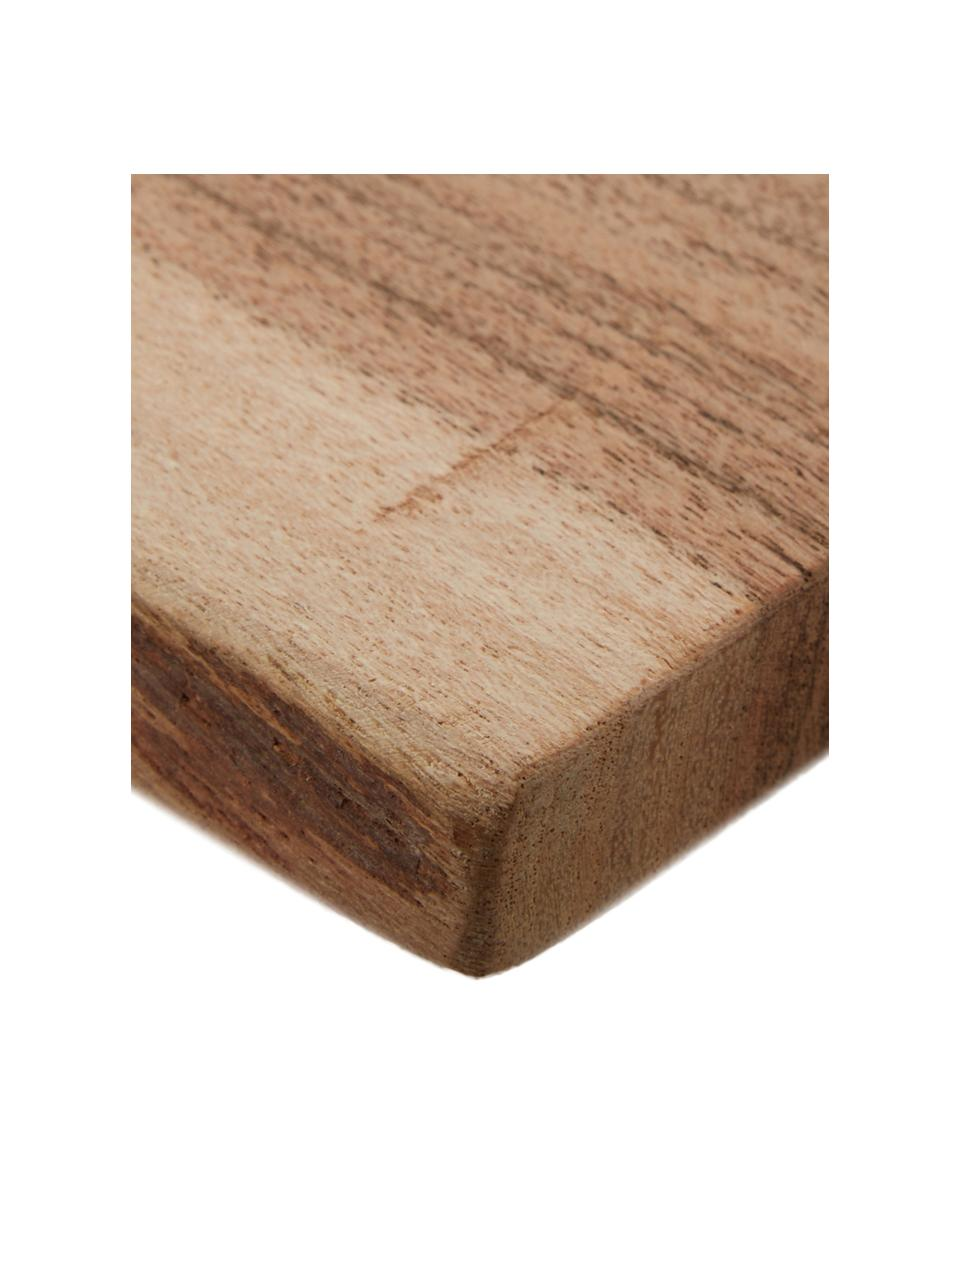 Acaciahouten snijplank Limitless, L 65 x B 15 cm, Acaciahout, Acaciahoutkleurig, 15 x 65 cm